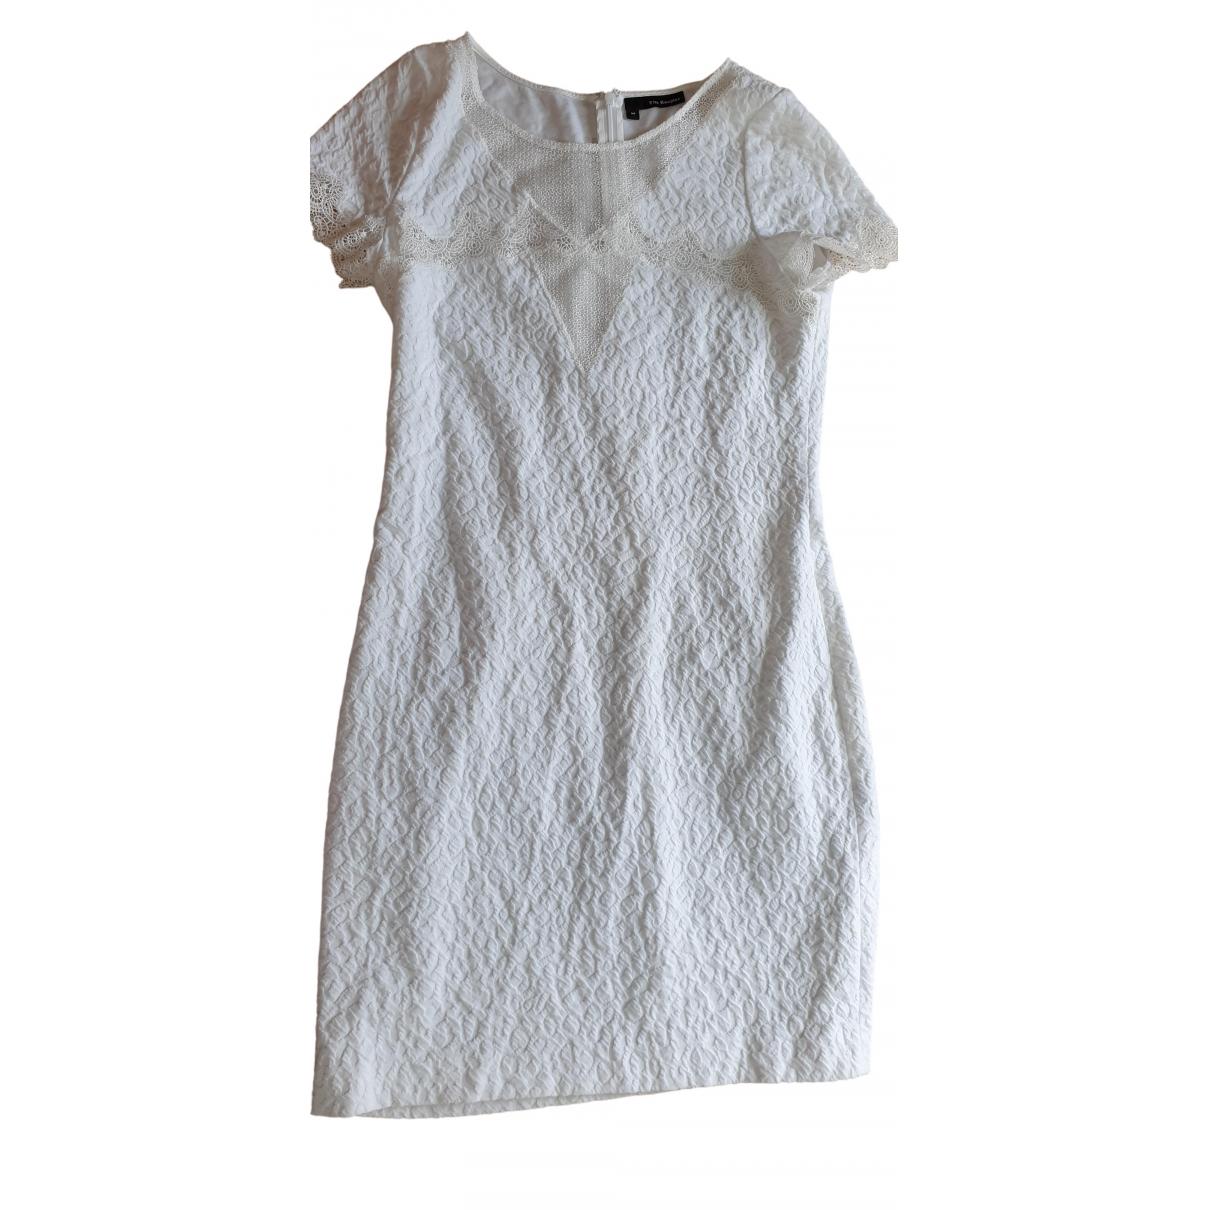 The Kooples \N White Cotton - elasthane dress for Women M International